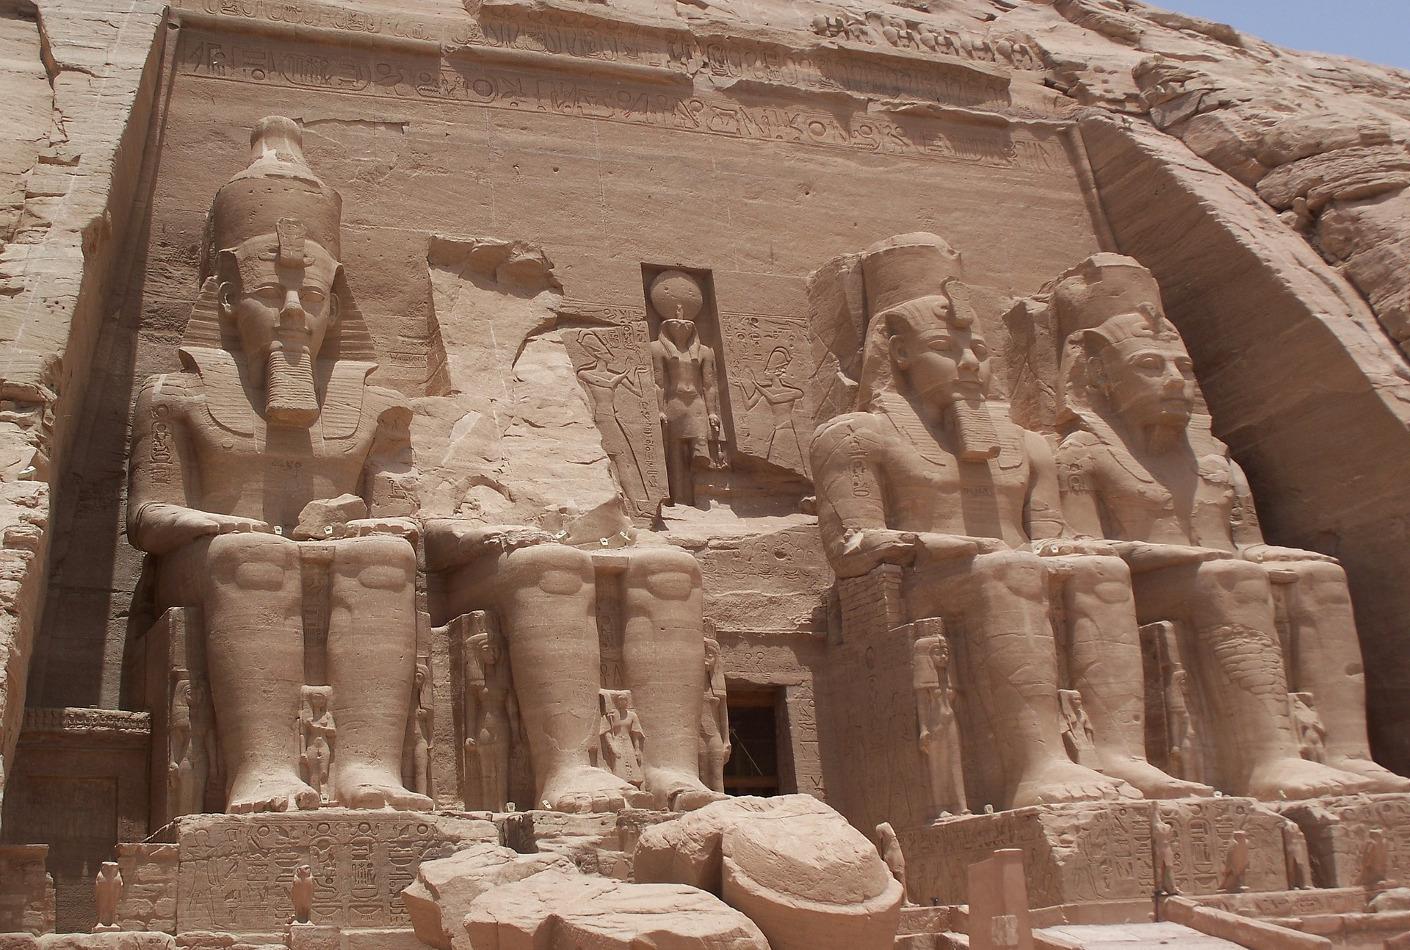 Tumba de Ramses II en Abu Simbel, Egipto. Superoferta para conocer Abu Simbel.